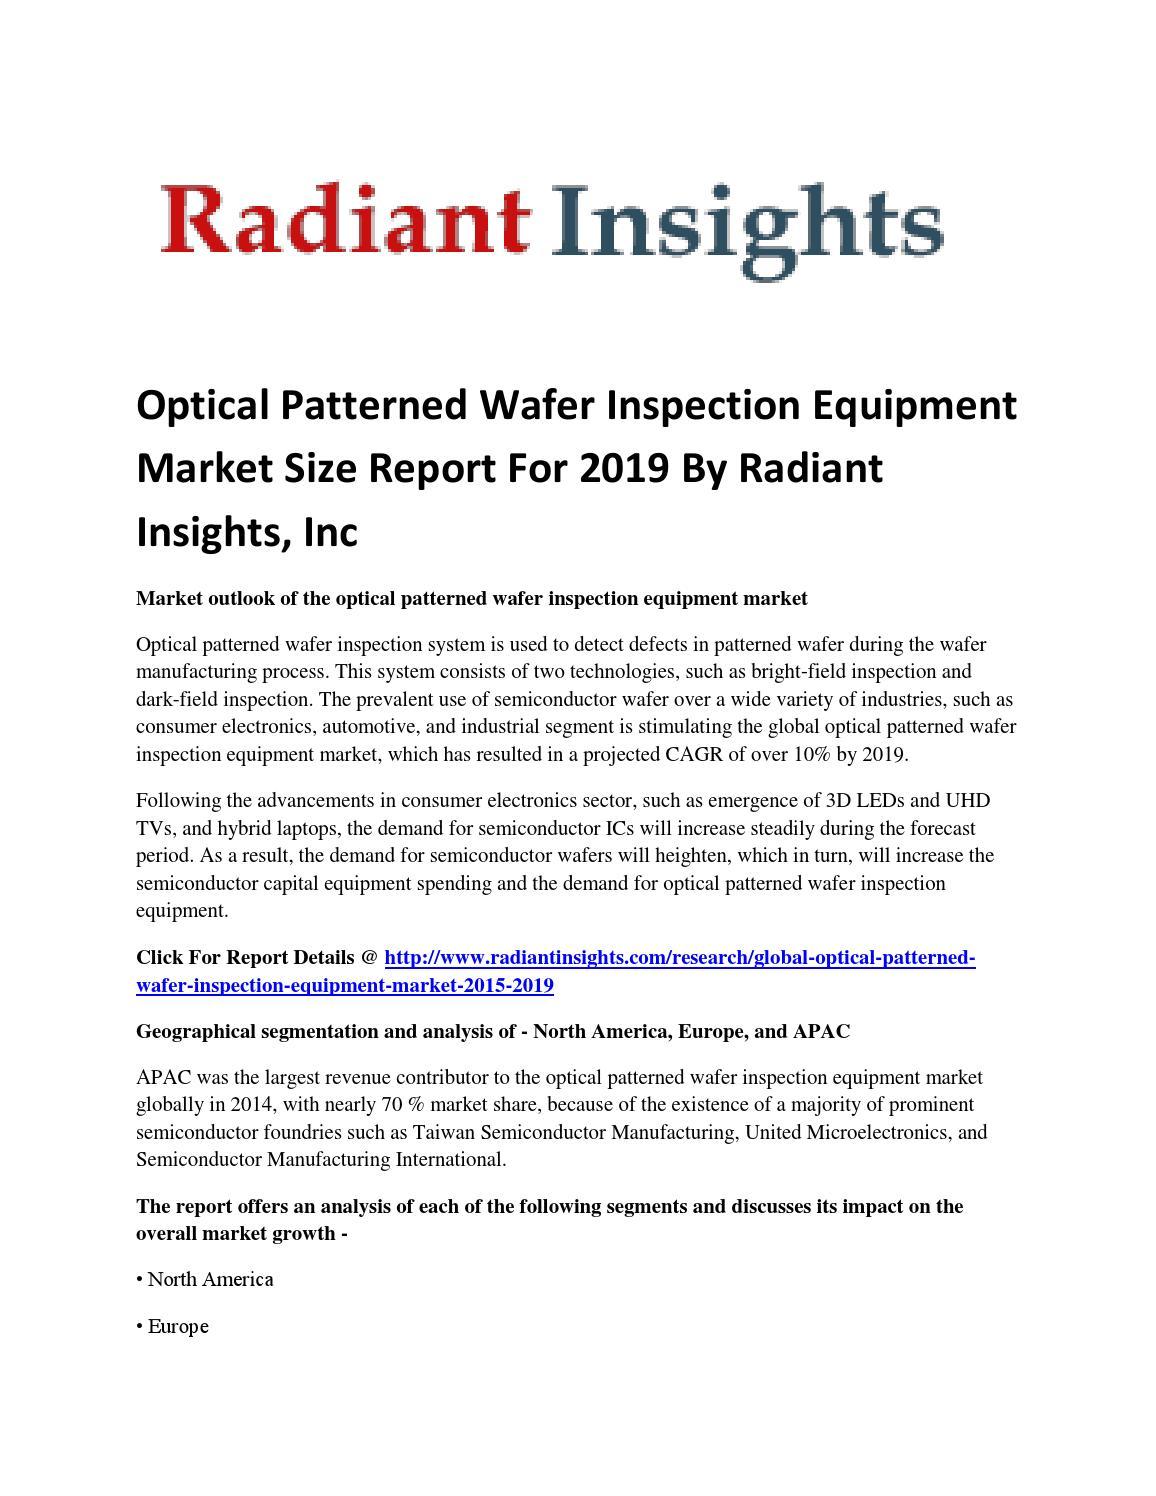 Market Study Optical Patterned Wafer Inspection